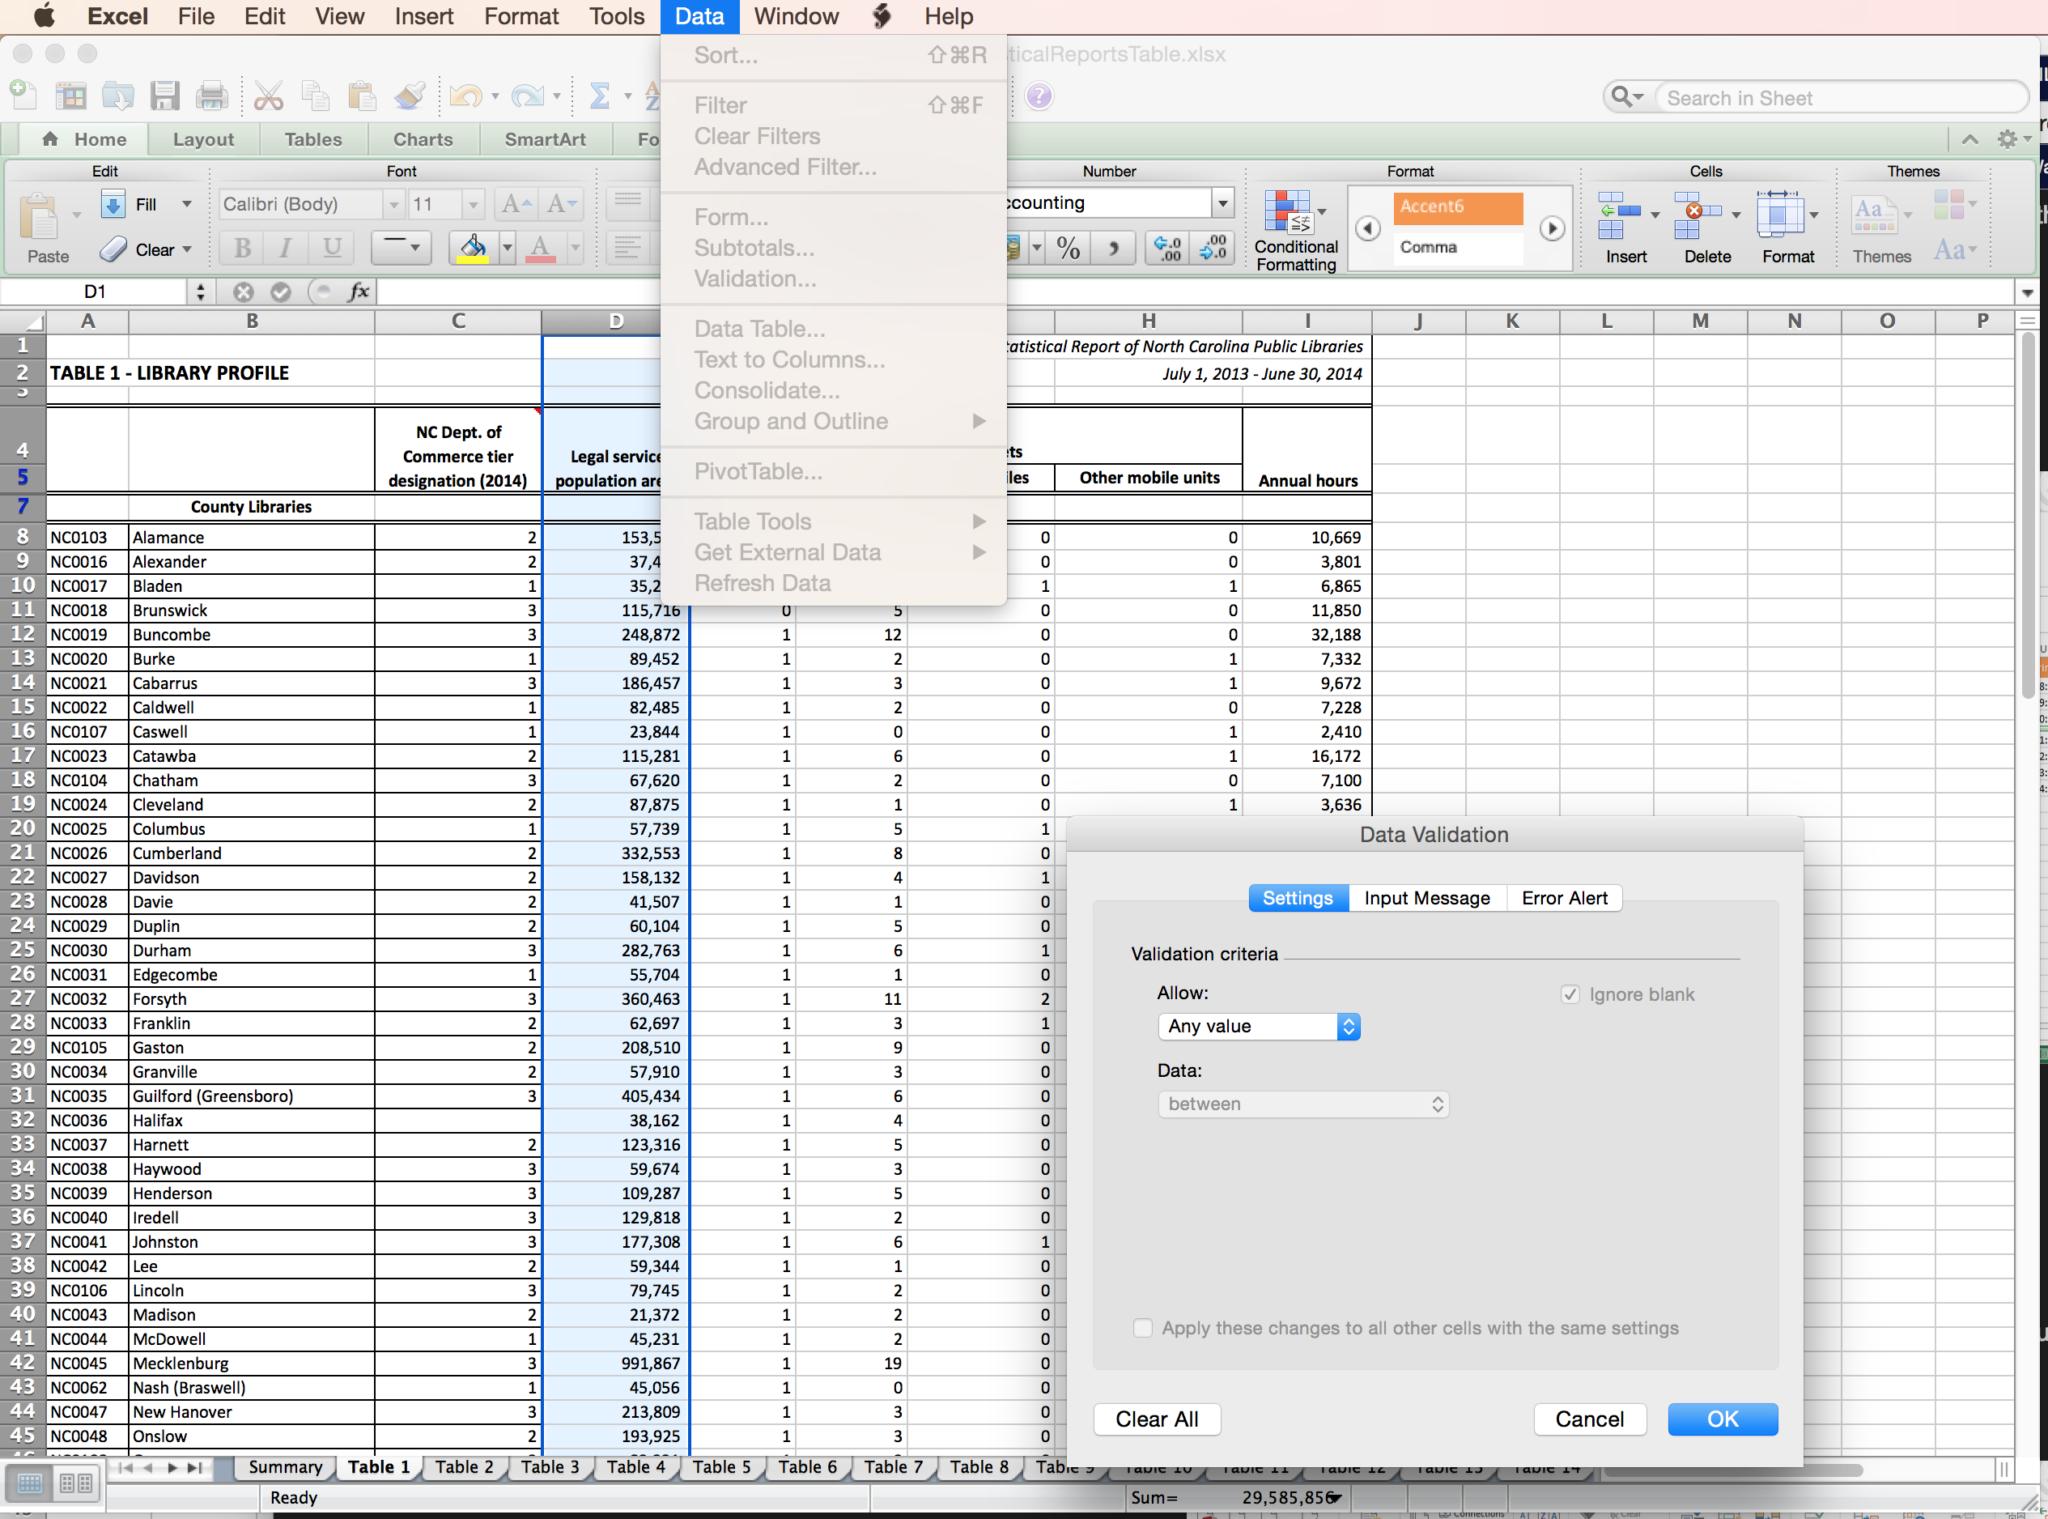 Excel Spreadsheet Validation For Fda 21 Cfr Part 1